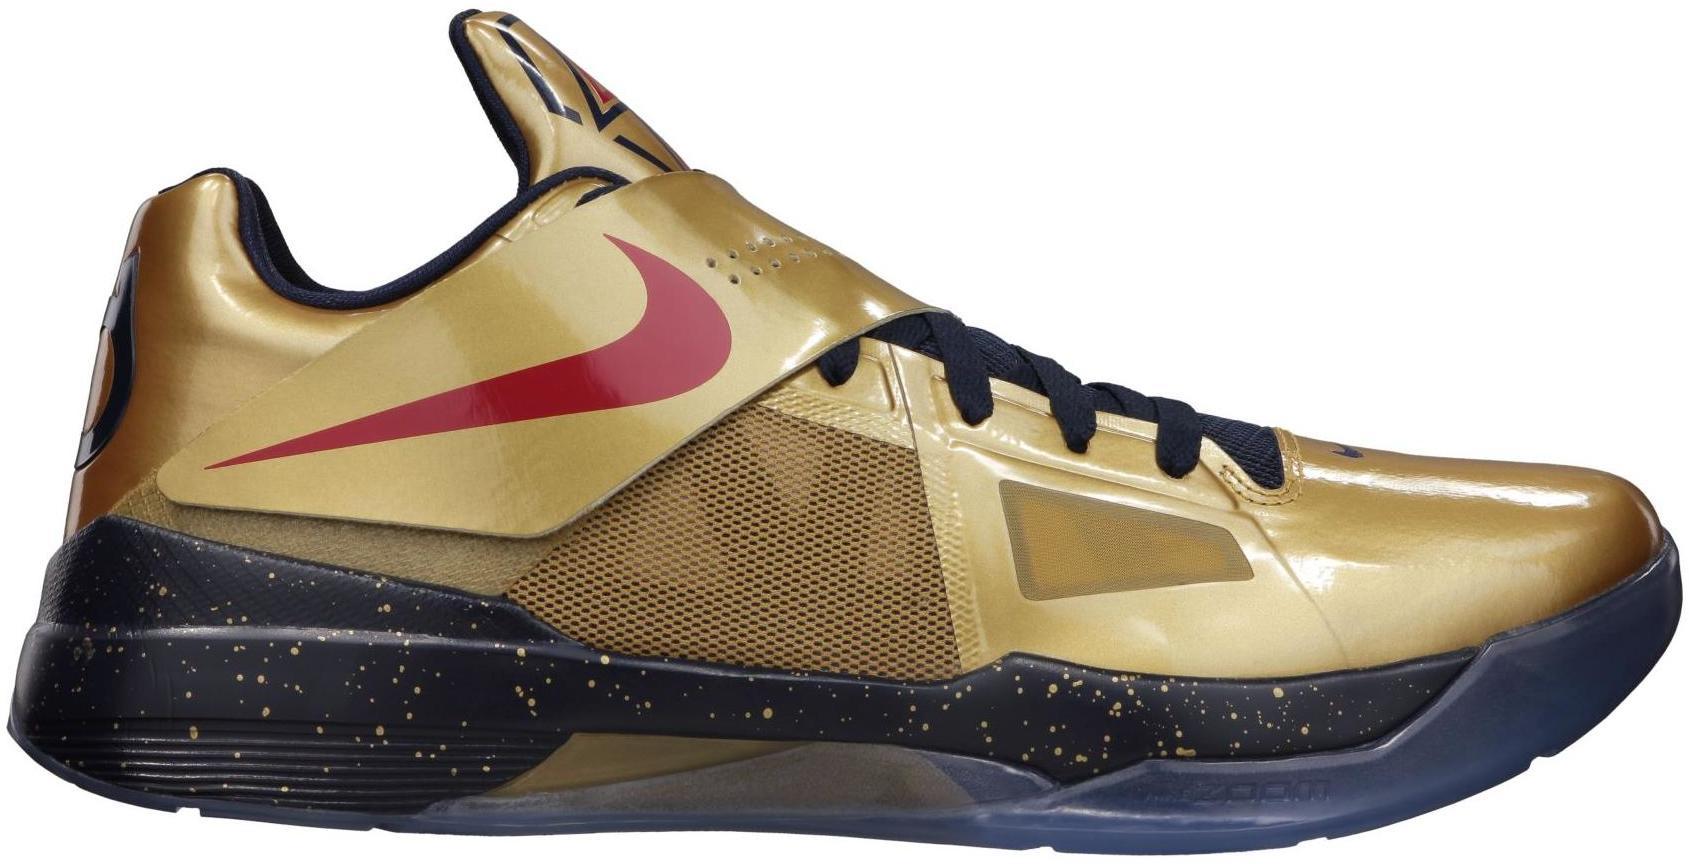 Nike KD 4 Gold Medal - 473679-702